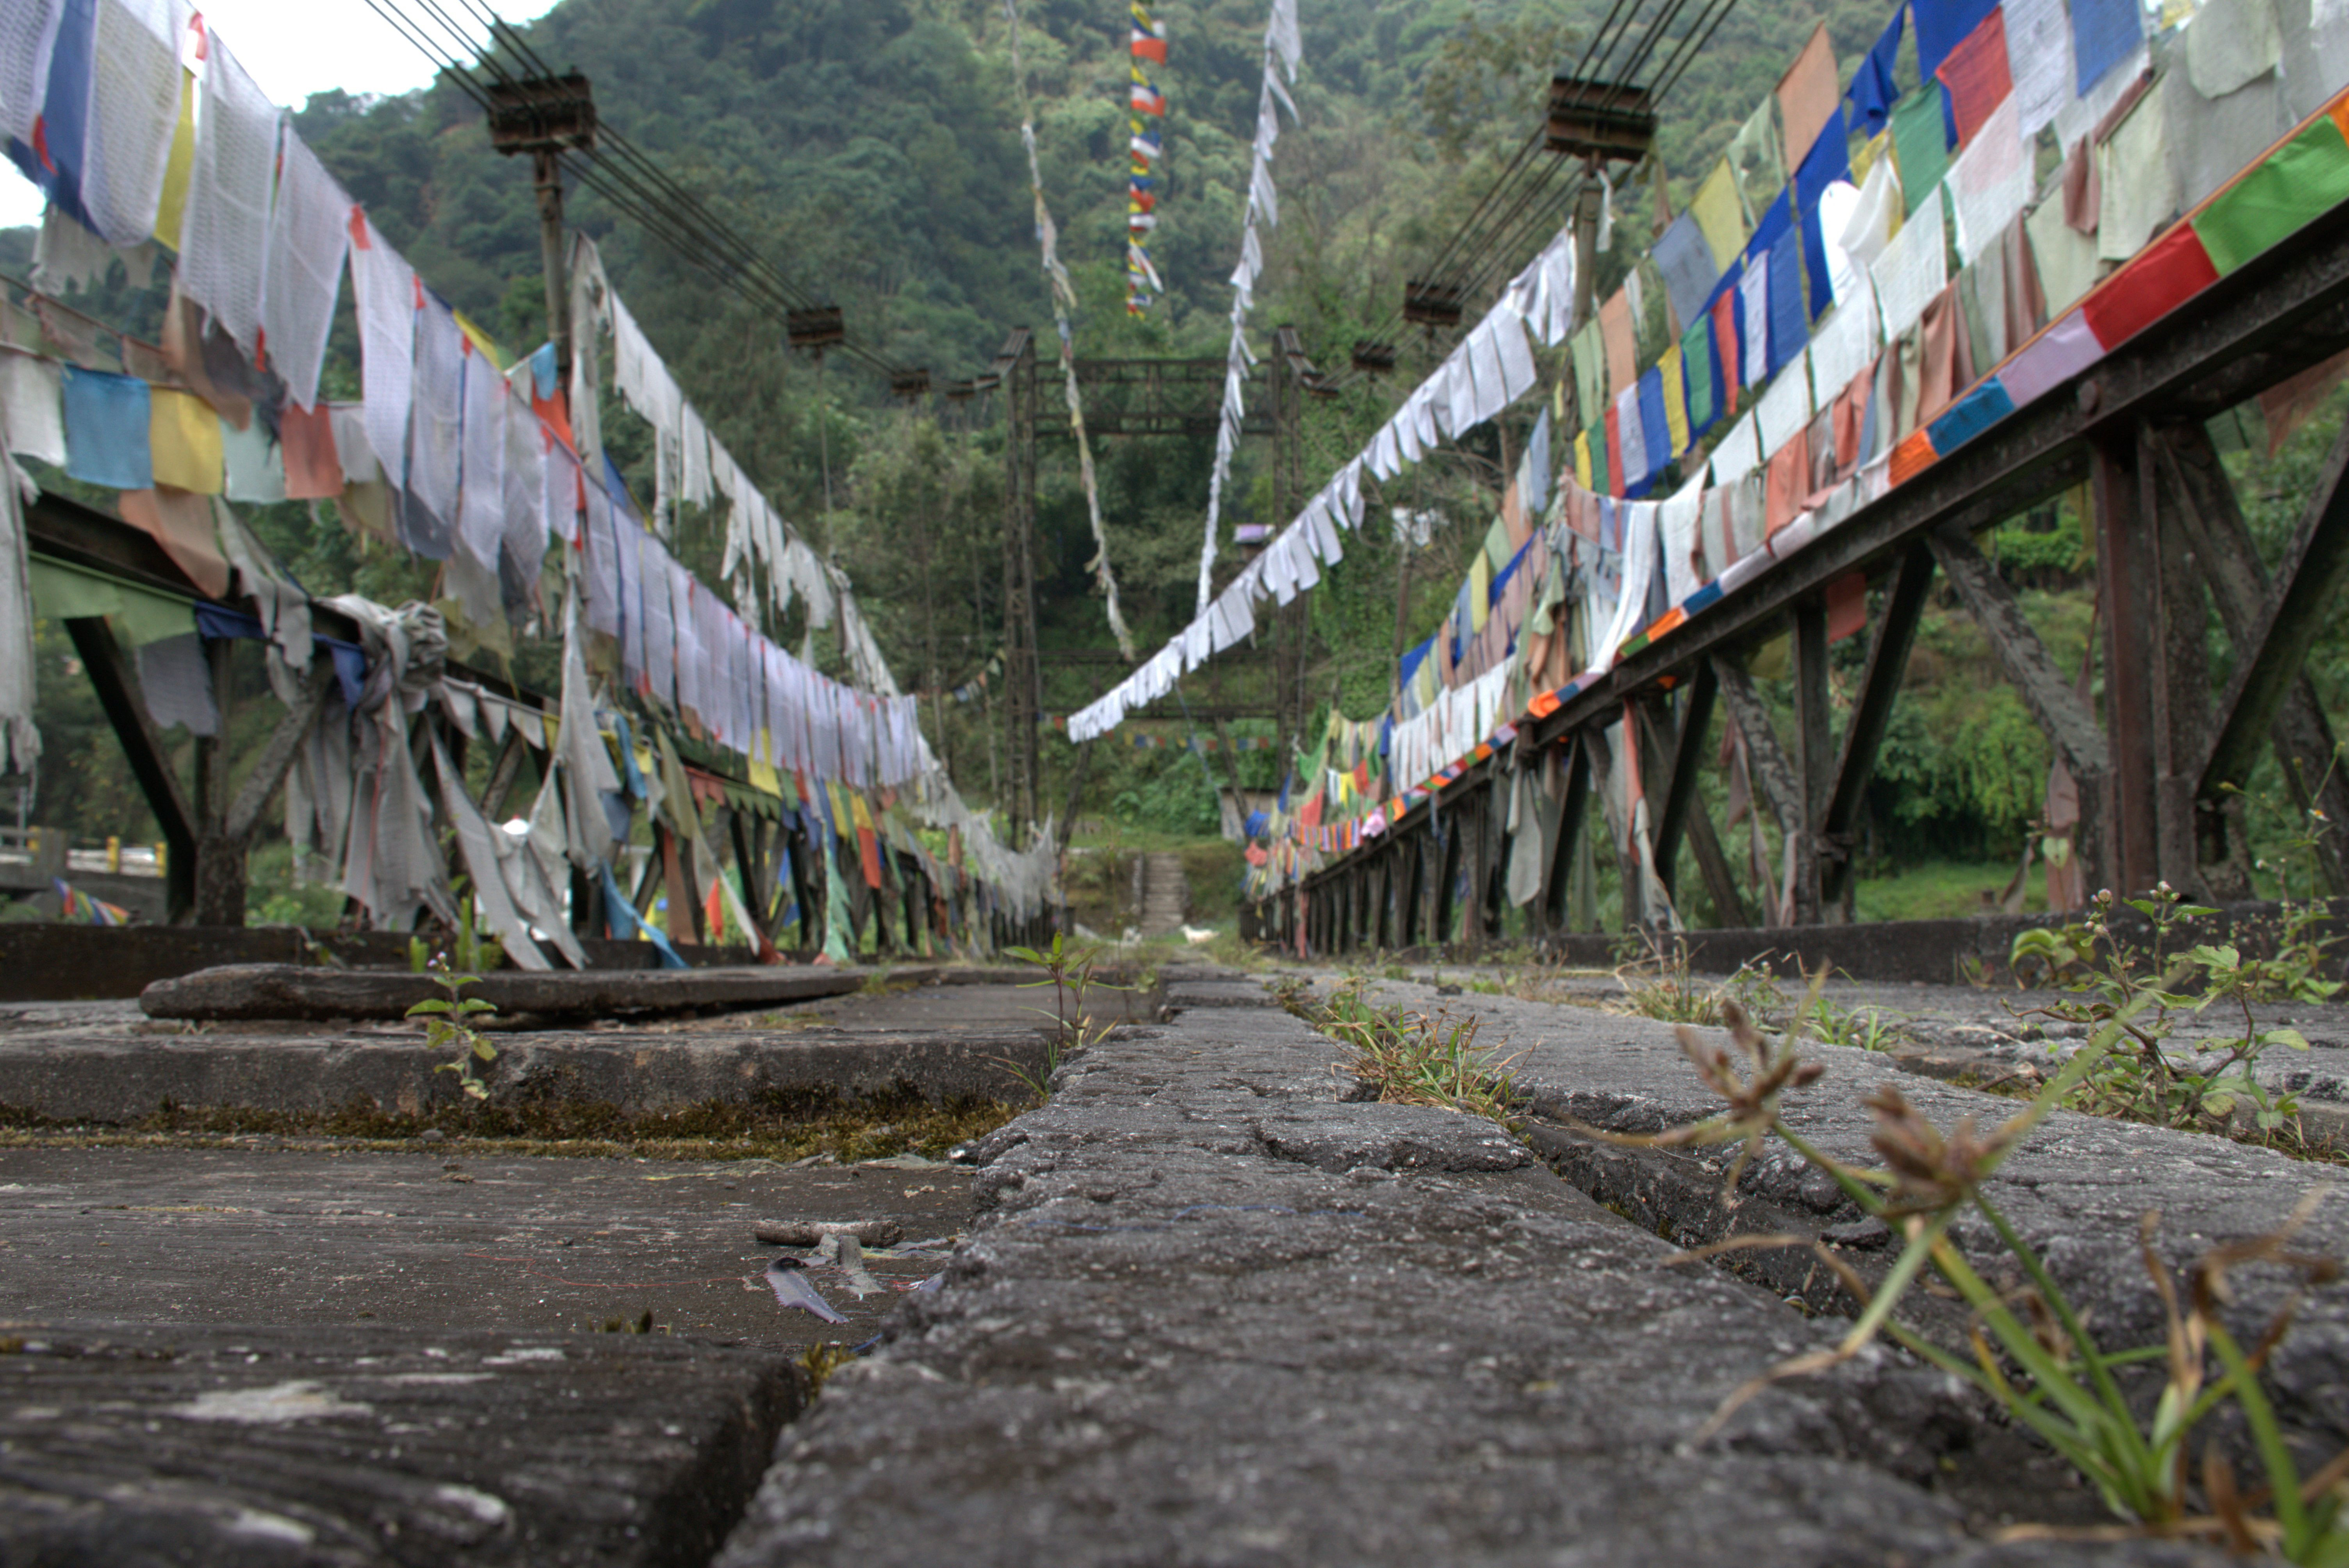 Somewhere in North Sikkim